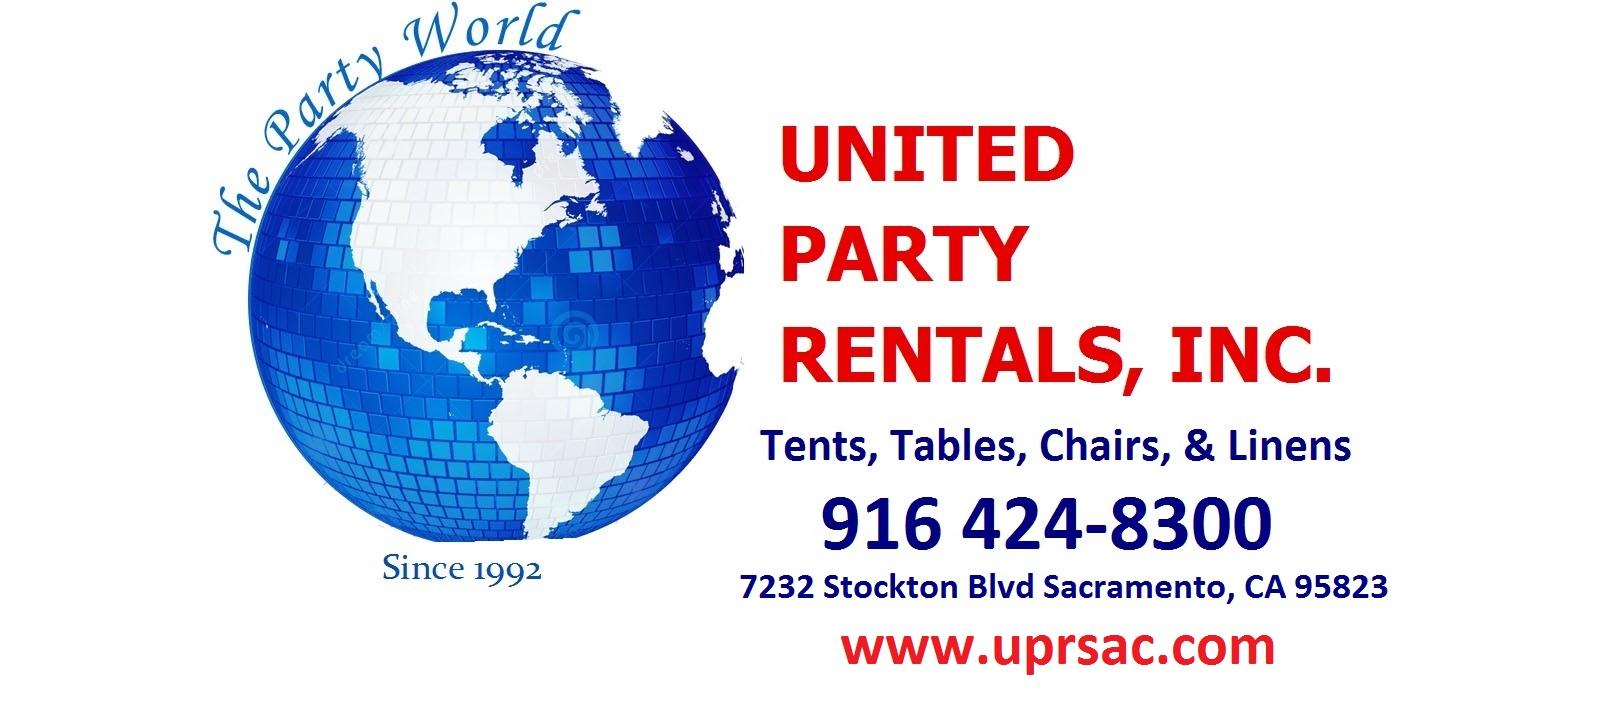 upr-logo-globe-2